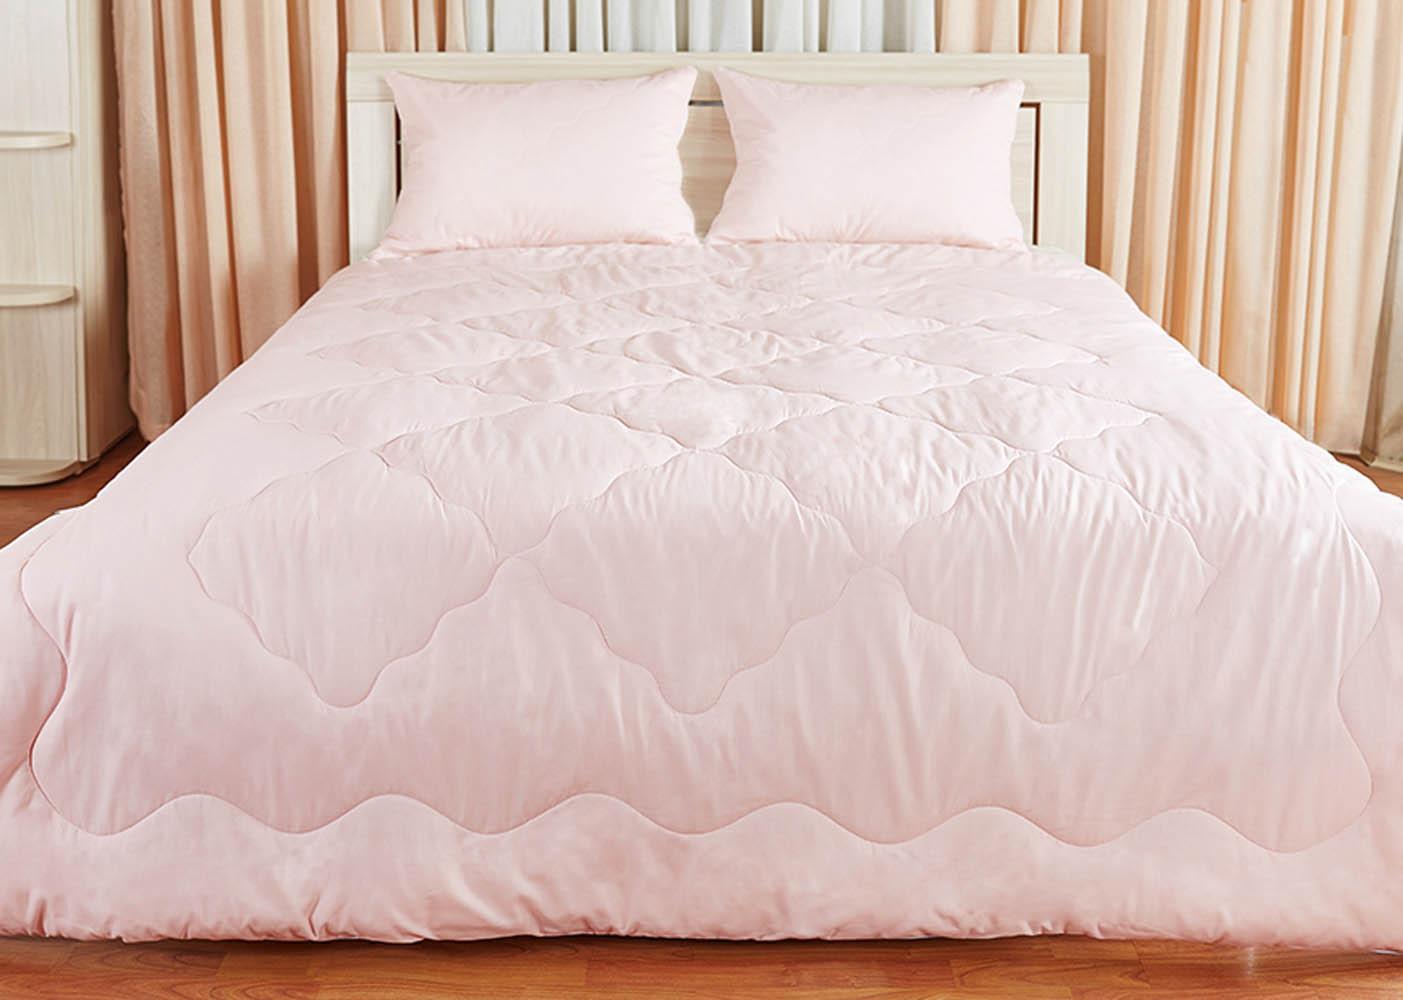 Одеяла Primavelle Одеяло Lavander Цвет: Розовый (145х205 см) лак для ногтей beautydrugs scented nail polish lavander цвет lavander variant hex name 9378ad